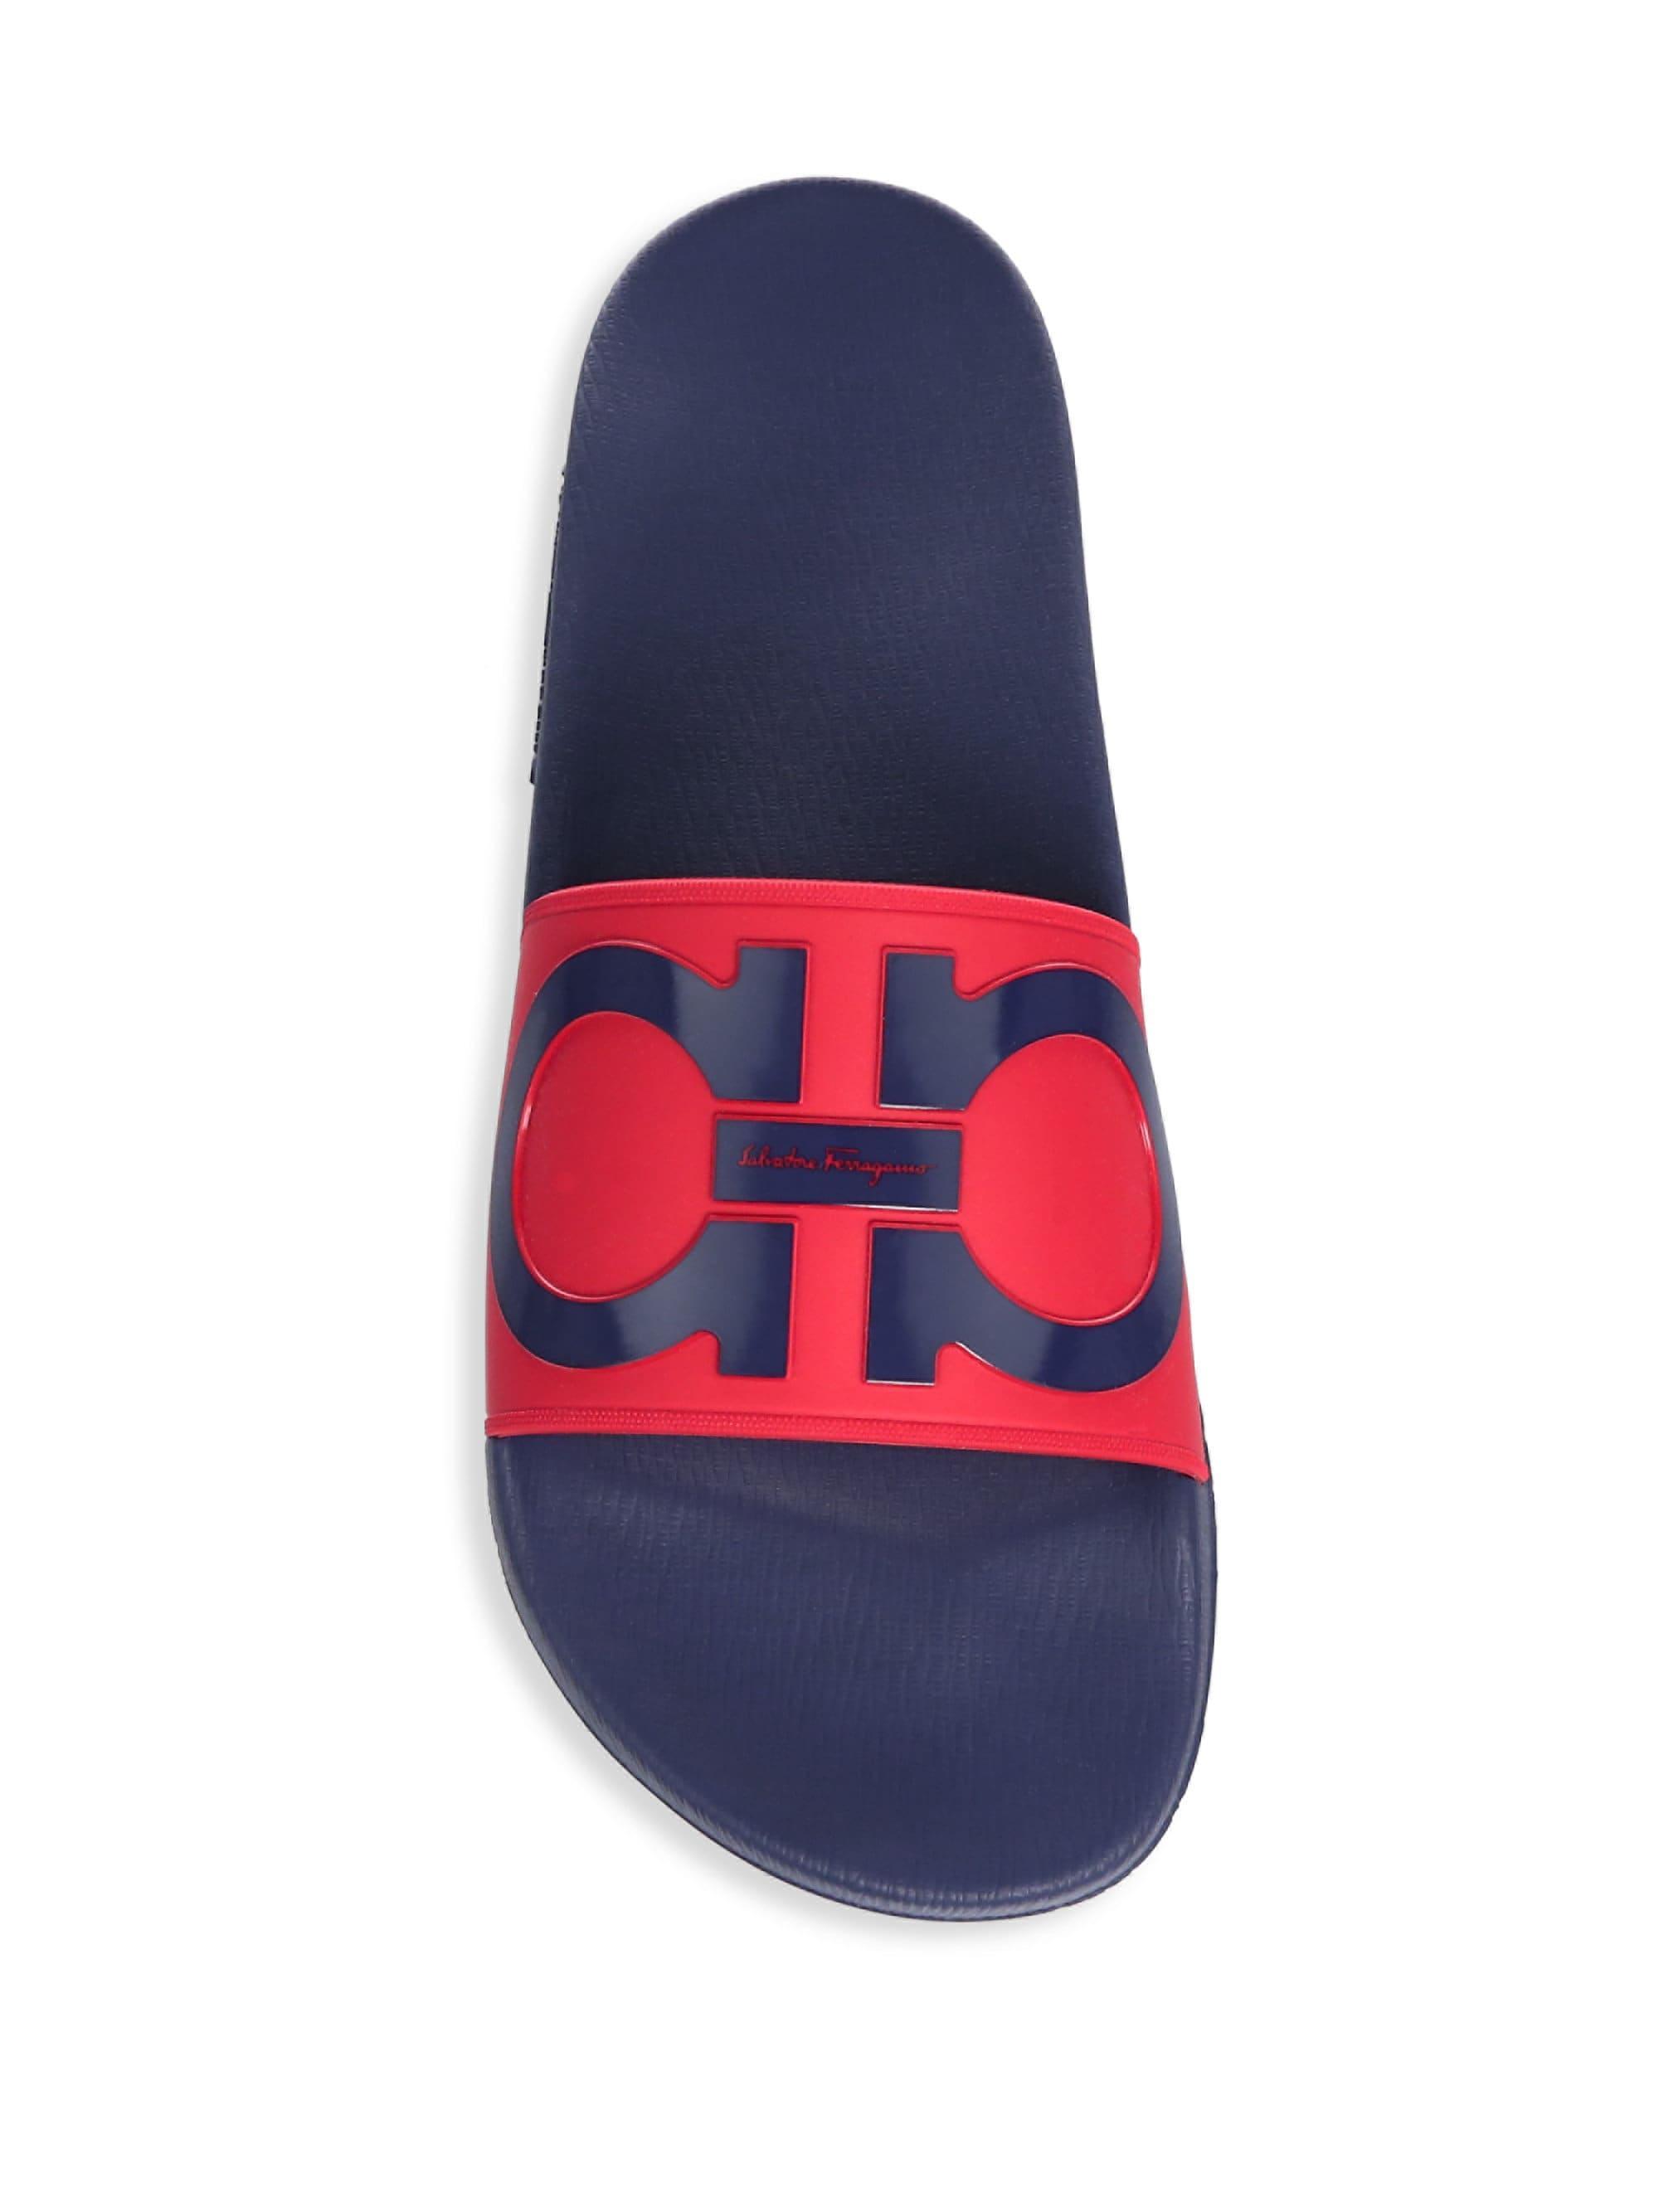 6167c85b4 Ferragamo Men s Gancini Pool Slide Sandals - Rosso - Size 7 M for Men - Lyst